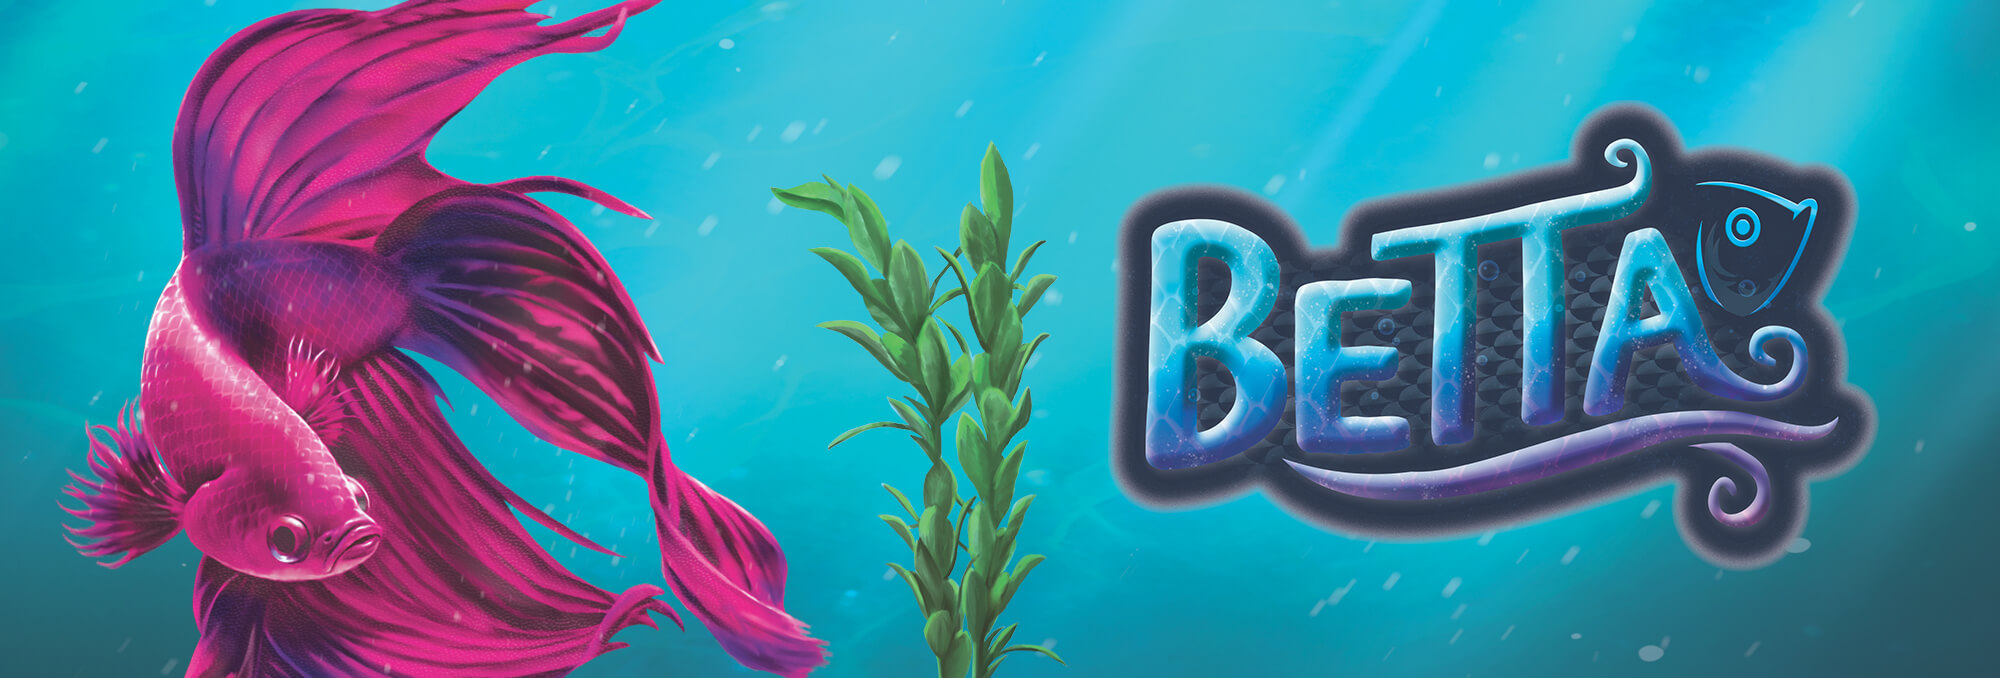 Betta-gamepagebanner